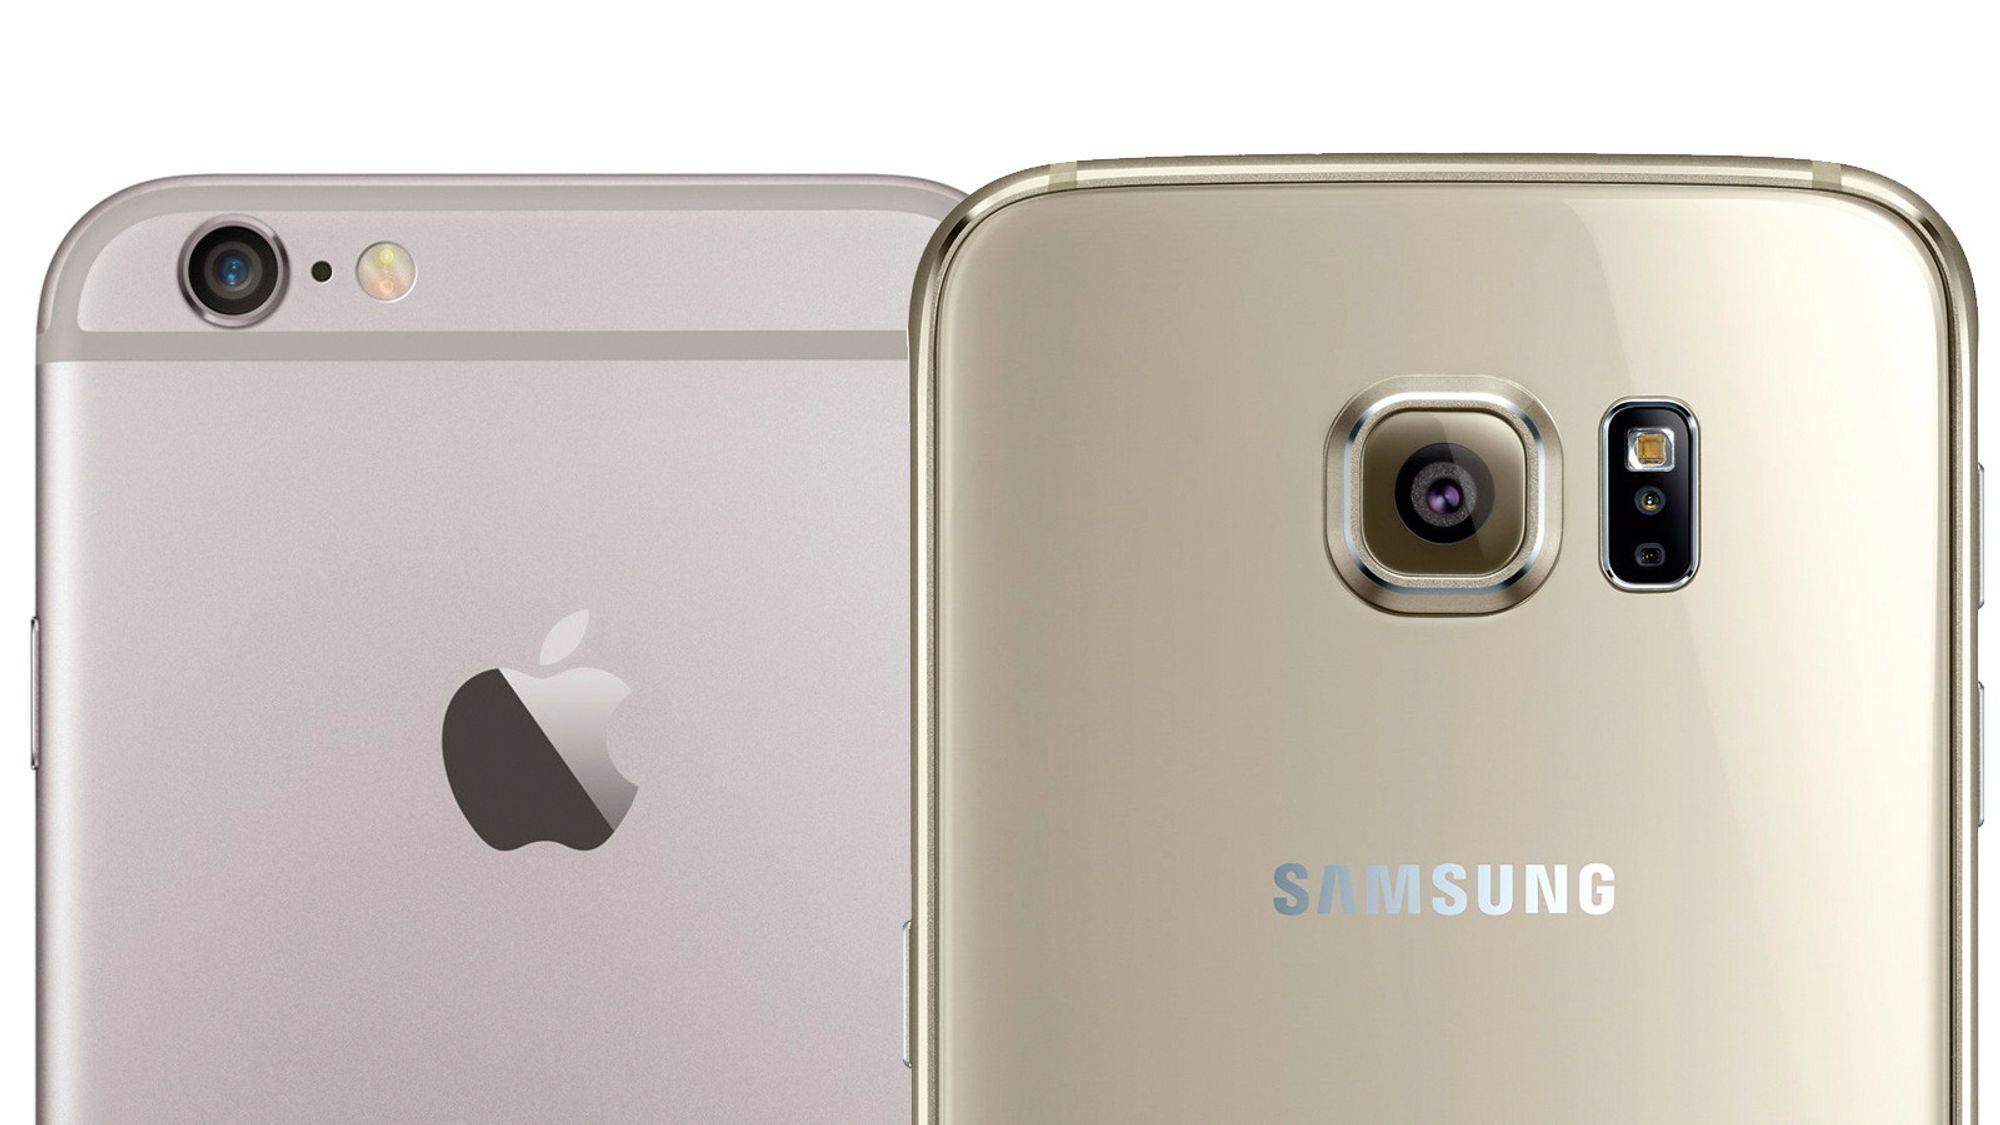 Best pris p Apple iPhone 5s 16GB Mobiltelefon - Sammenlign priser